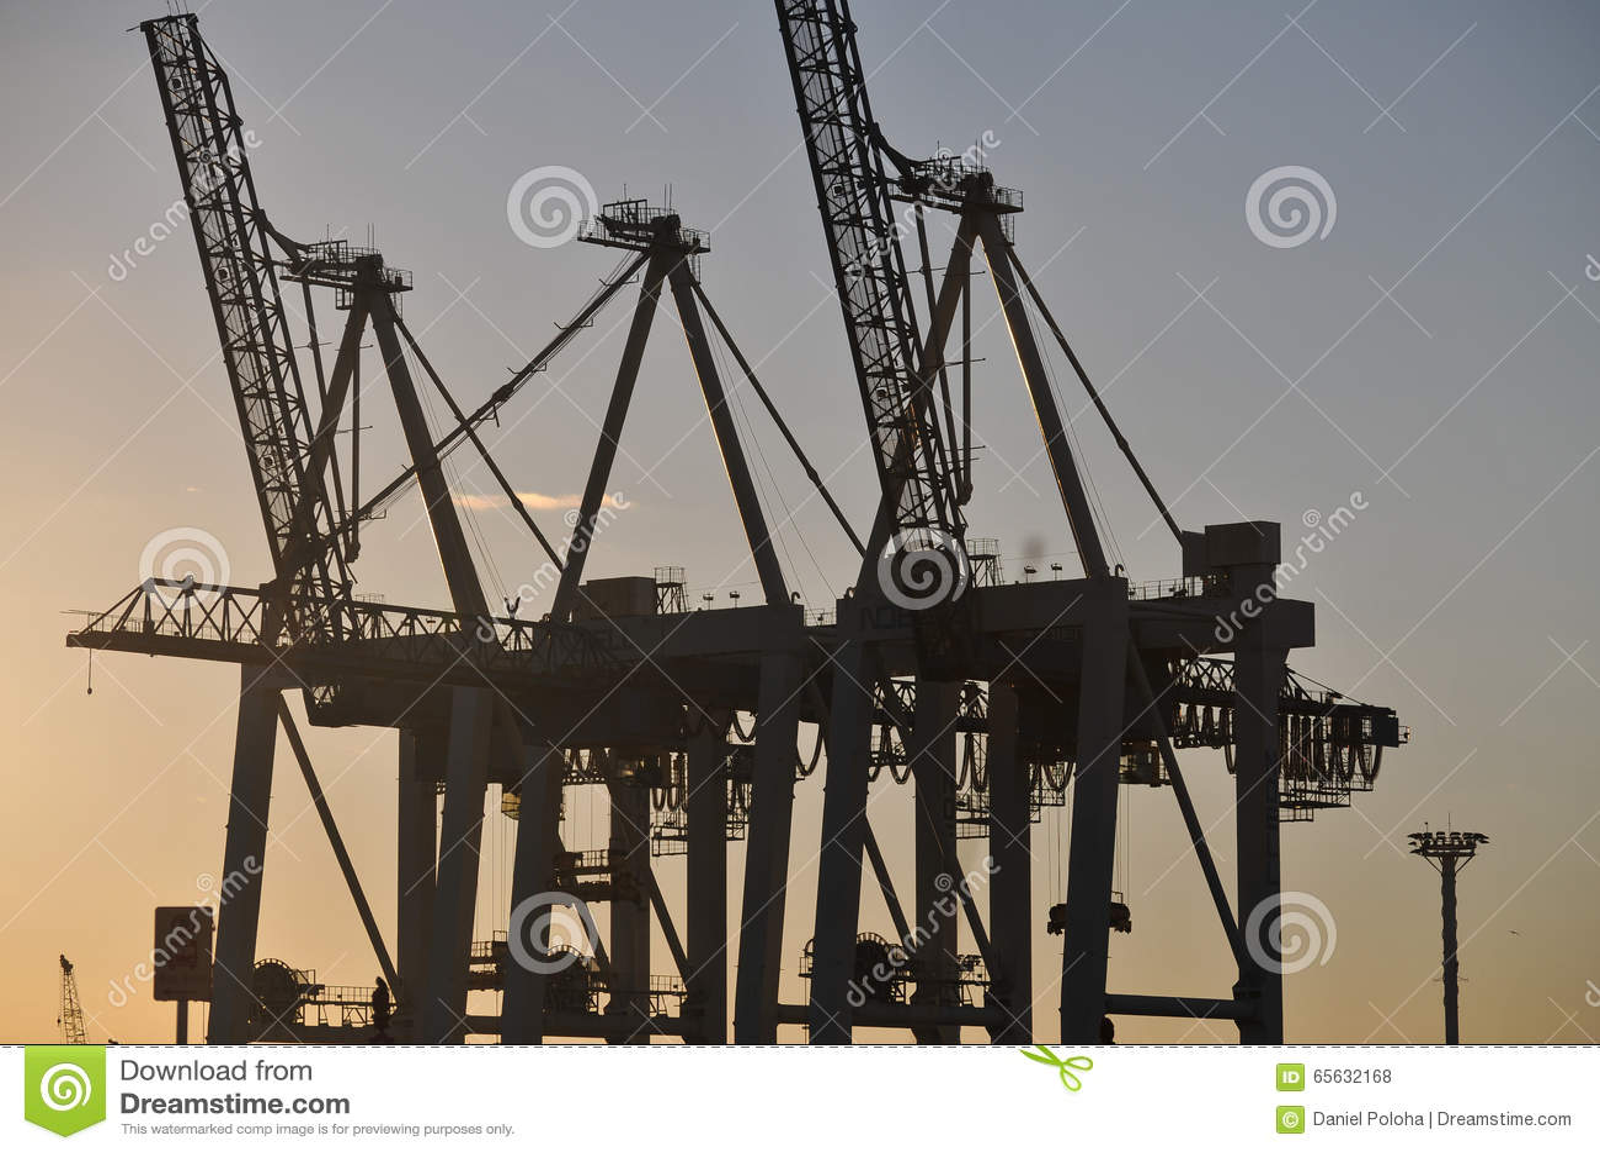 Le port tend le cou la silhouette